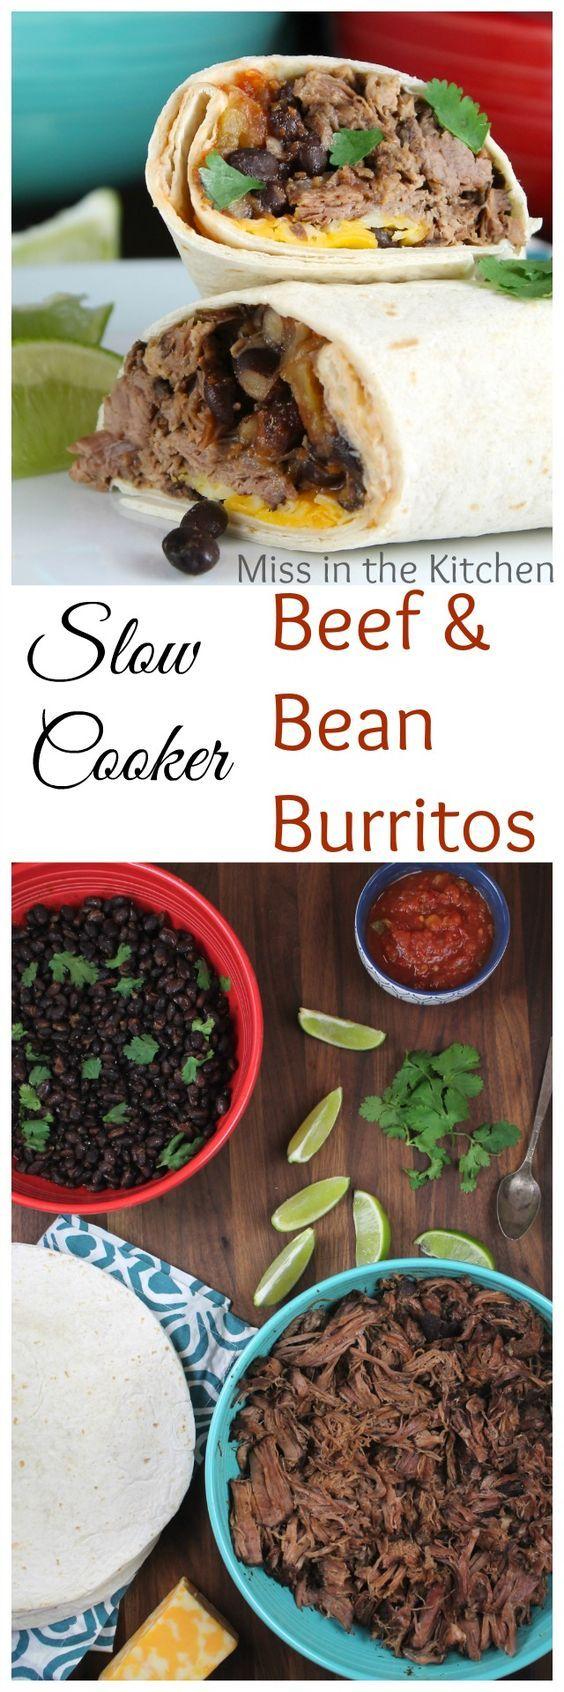 Slow Cooker Beef & Bean Burritos Recipe found at MissintheKitchen.com